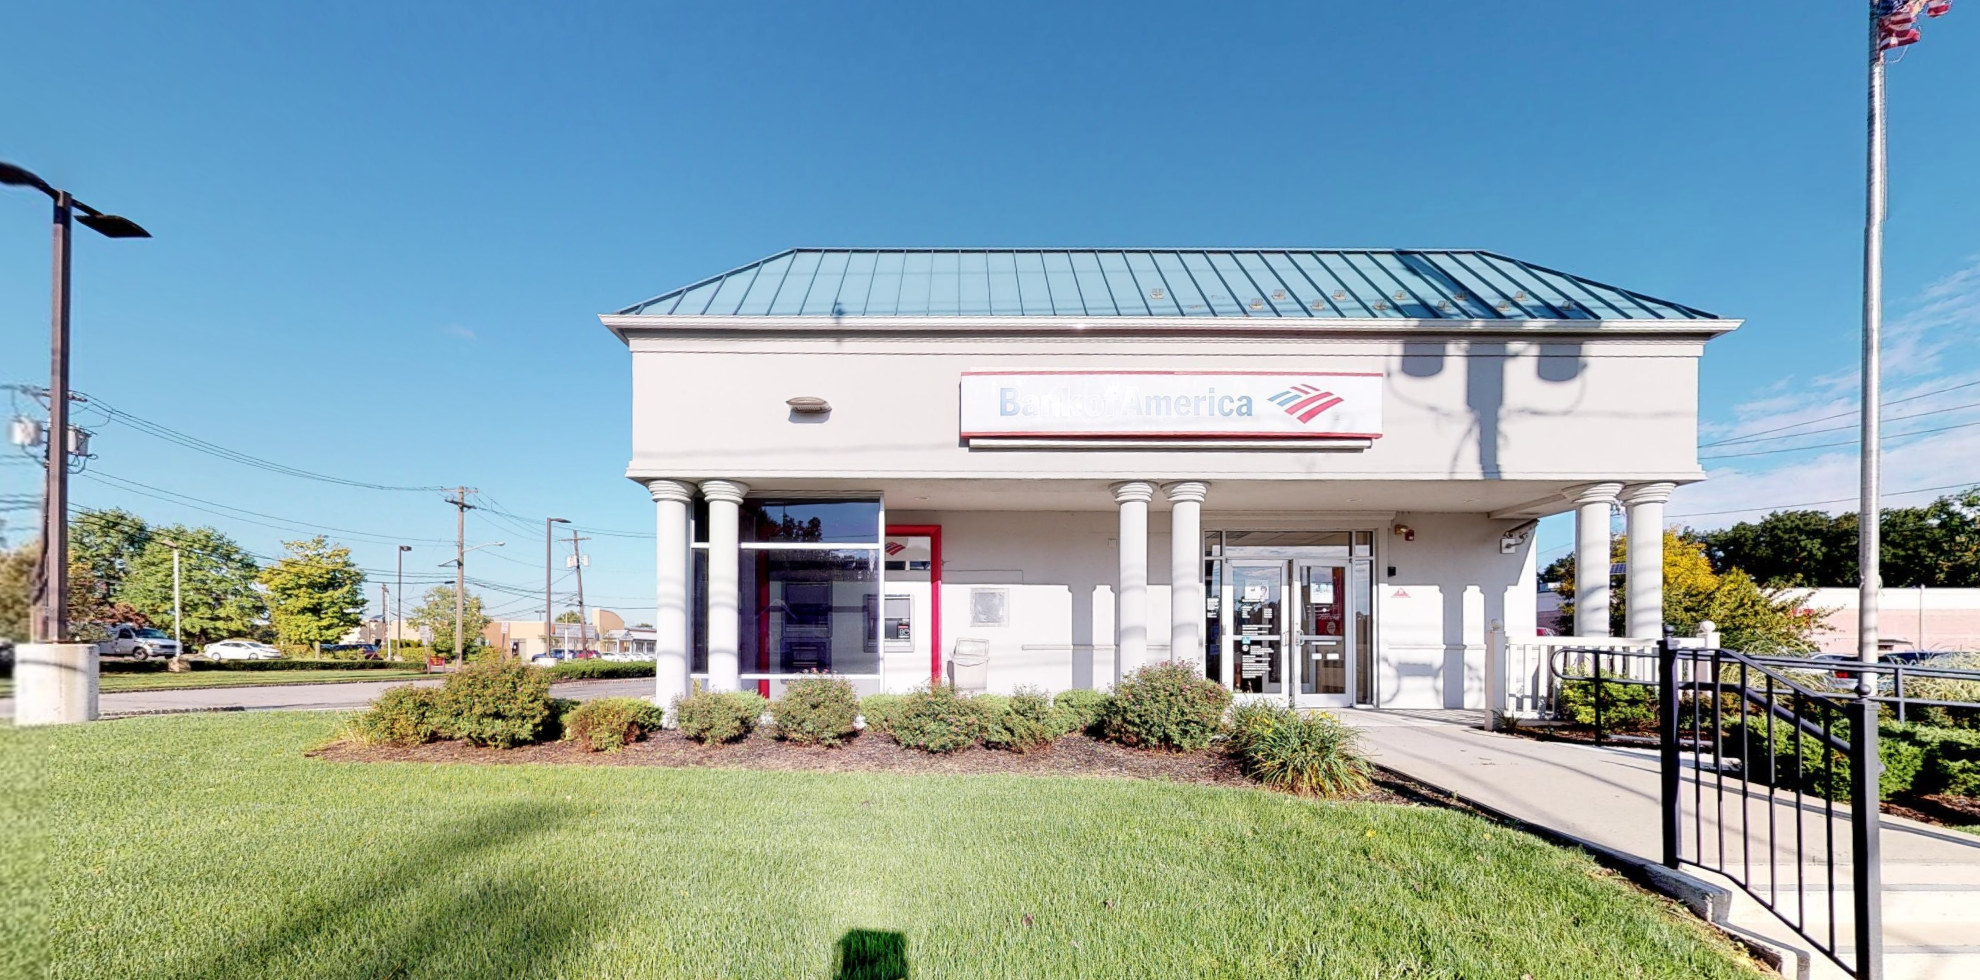 Bank of America financial center with drive-thru ATM   1050 Raritan Rd, Clark, NJ 07066